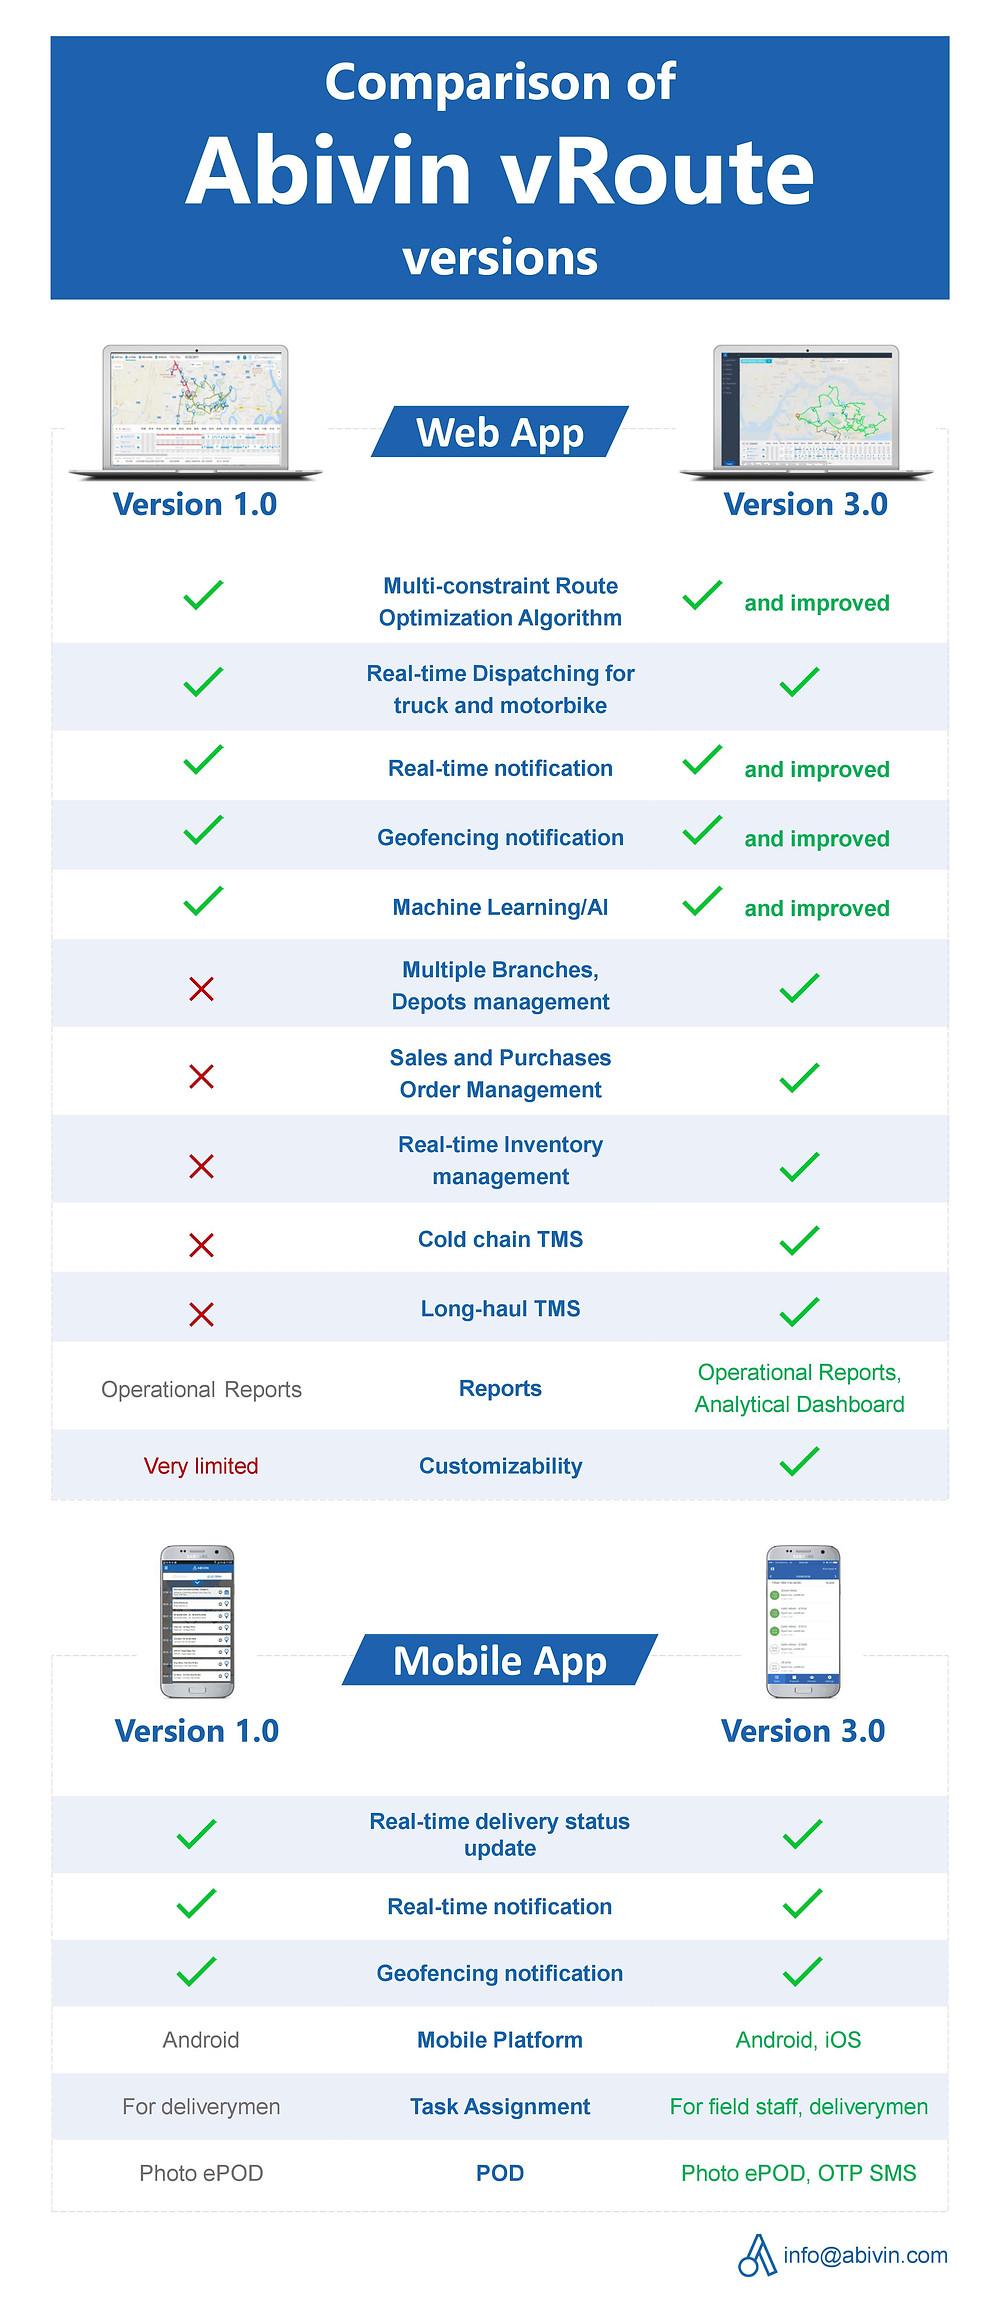 Comparison of Abivin vRoute Versions 1.0 and 3.0